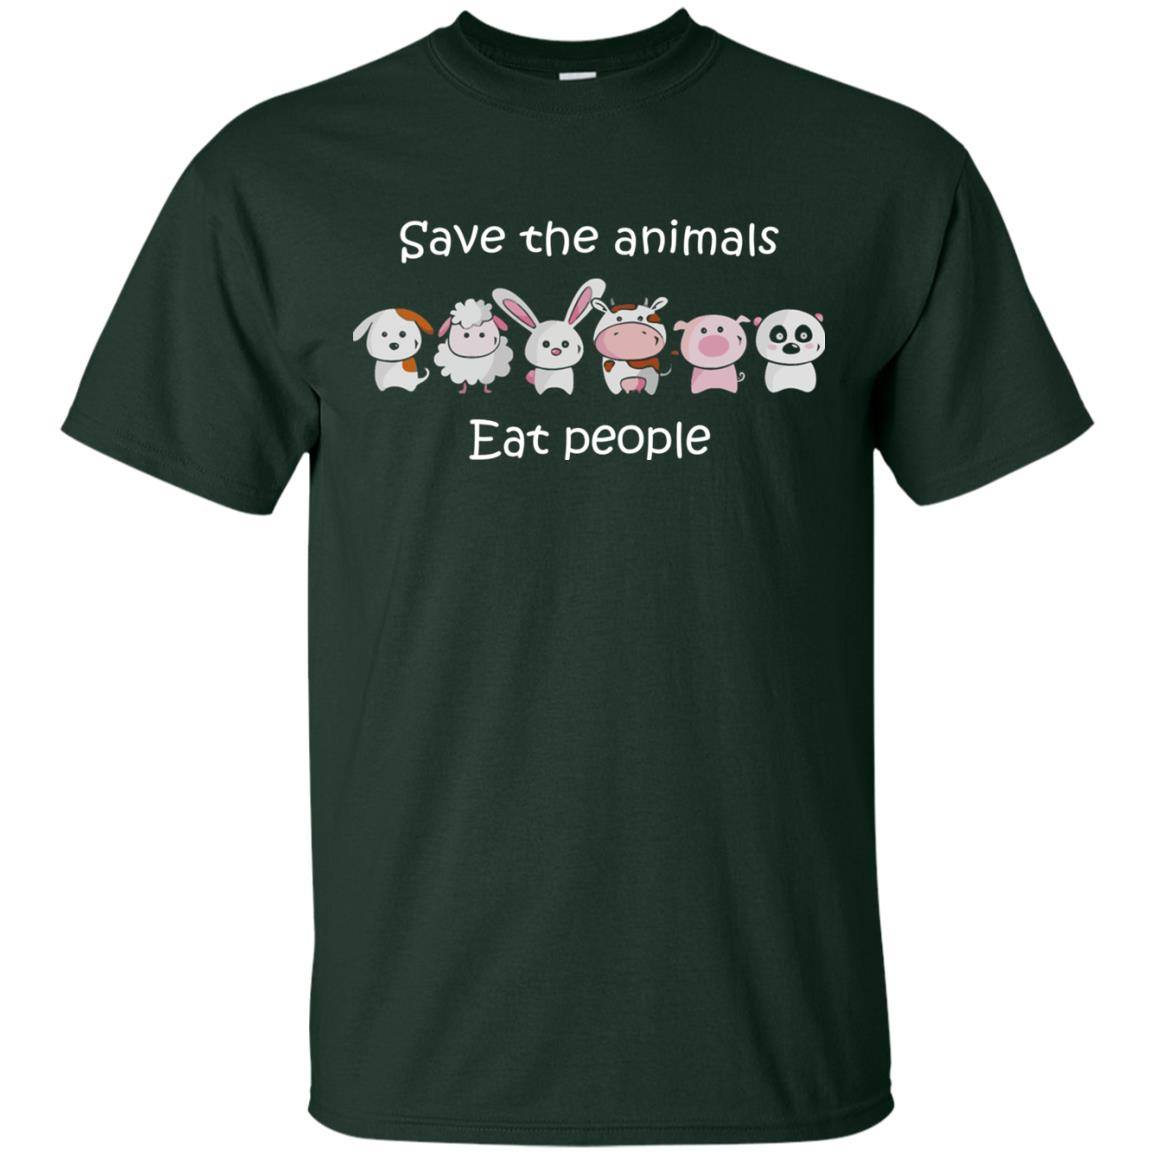 image 1510px Funny vegan shirt: save the animals eat people t shirt, hoodies, tank top